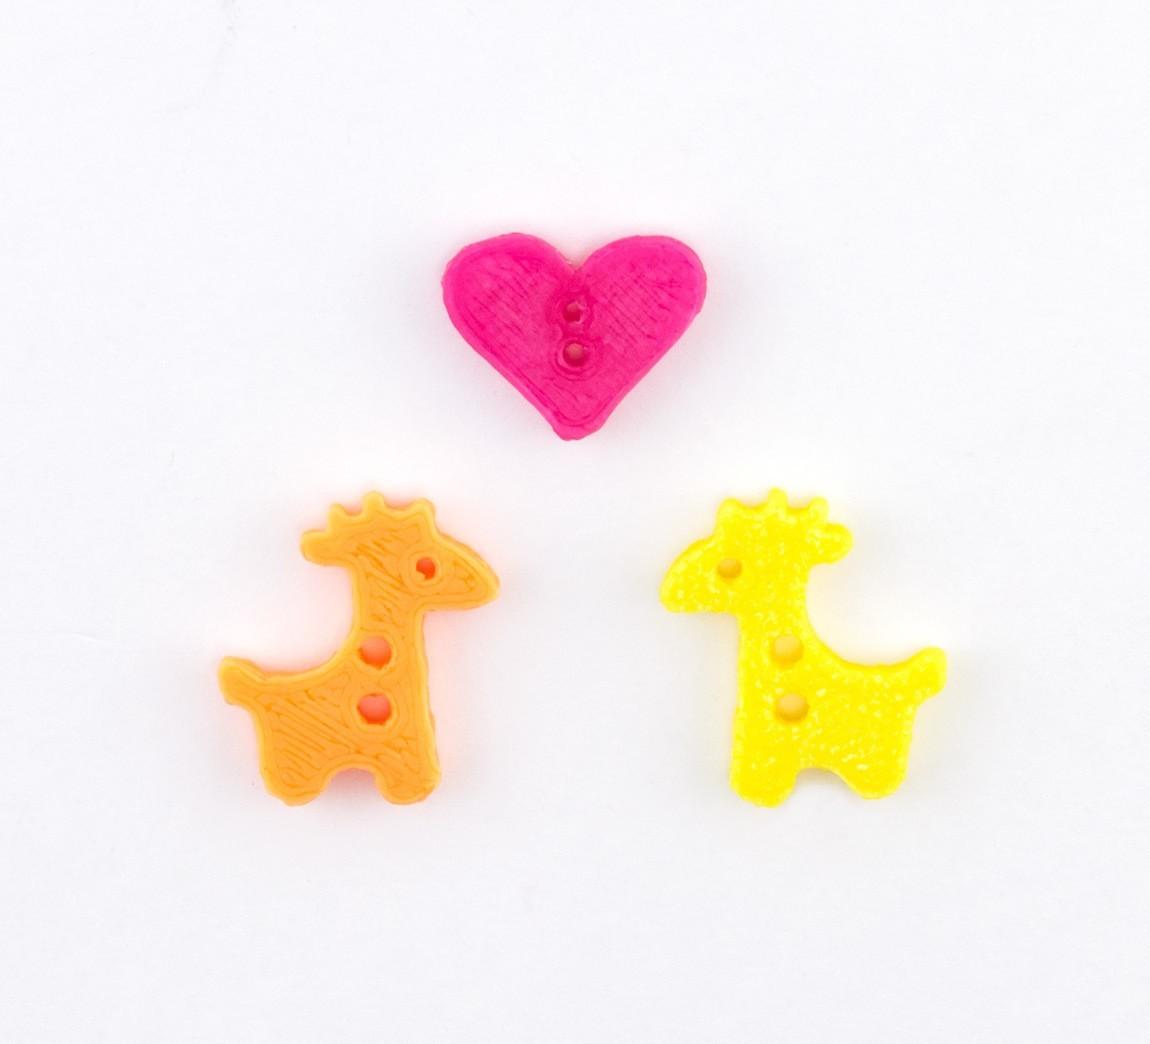 757cad3f6758cf3959aaf6d76cdd6f84_1443206282851_NMD000112-166_@2x.jpg Download free STL file Giraffe Button • 3D print model, Lucy_Haribert